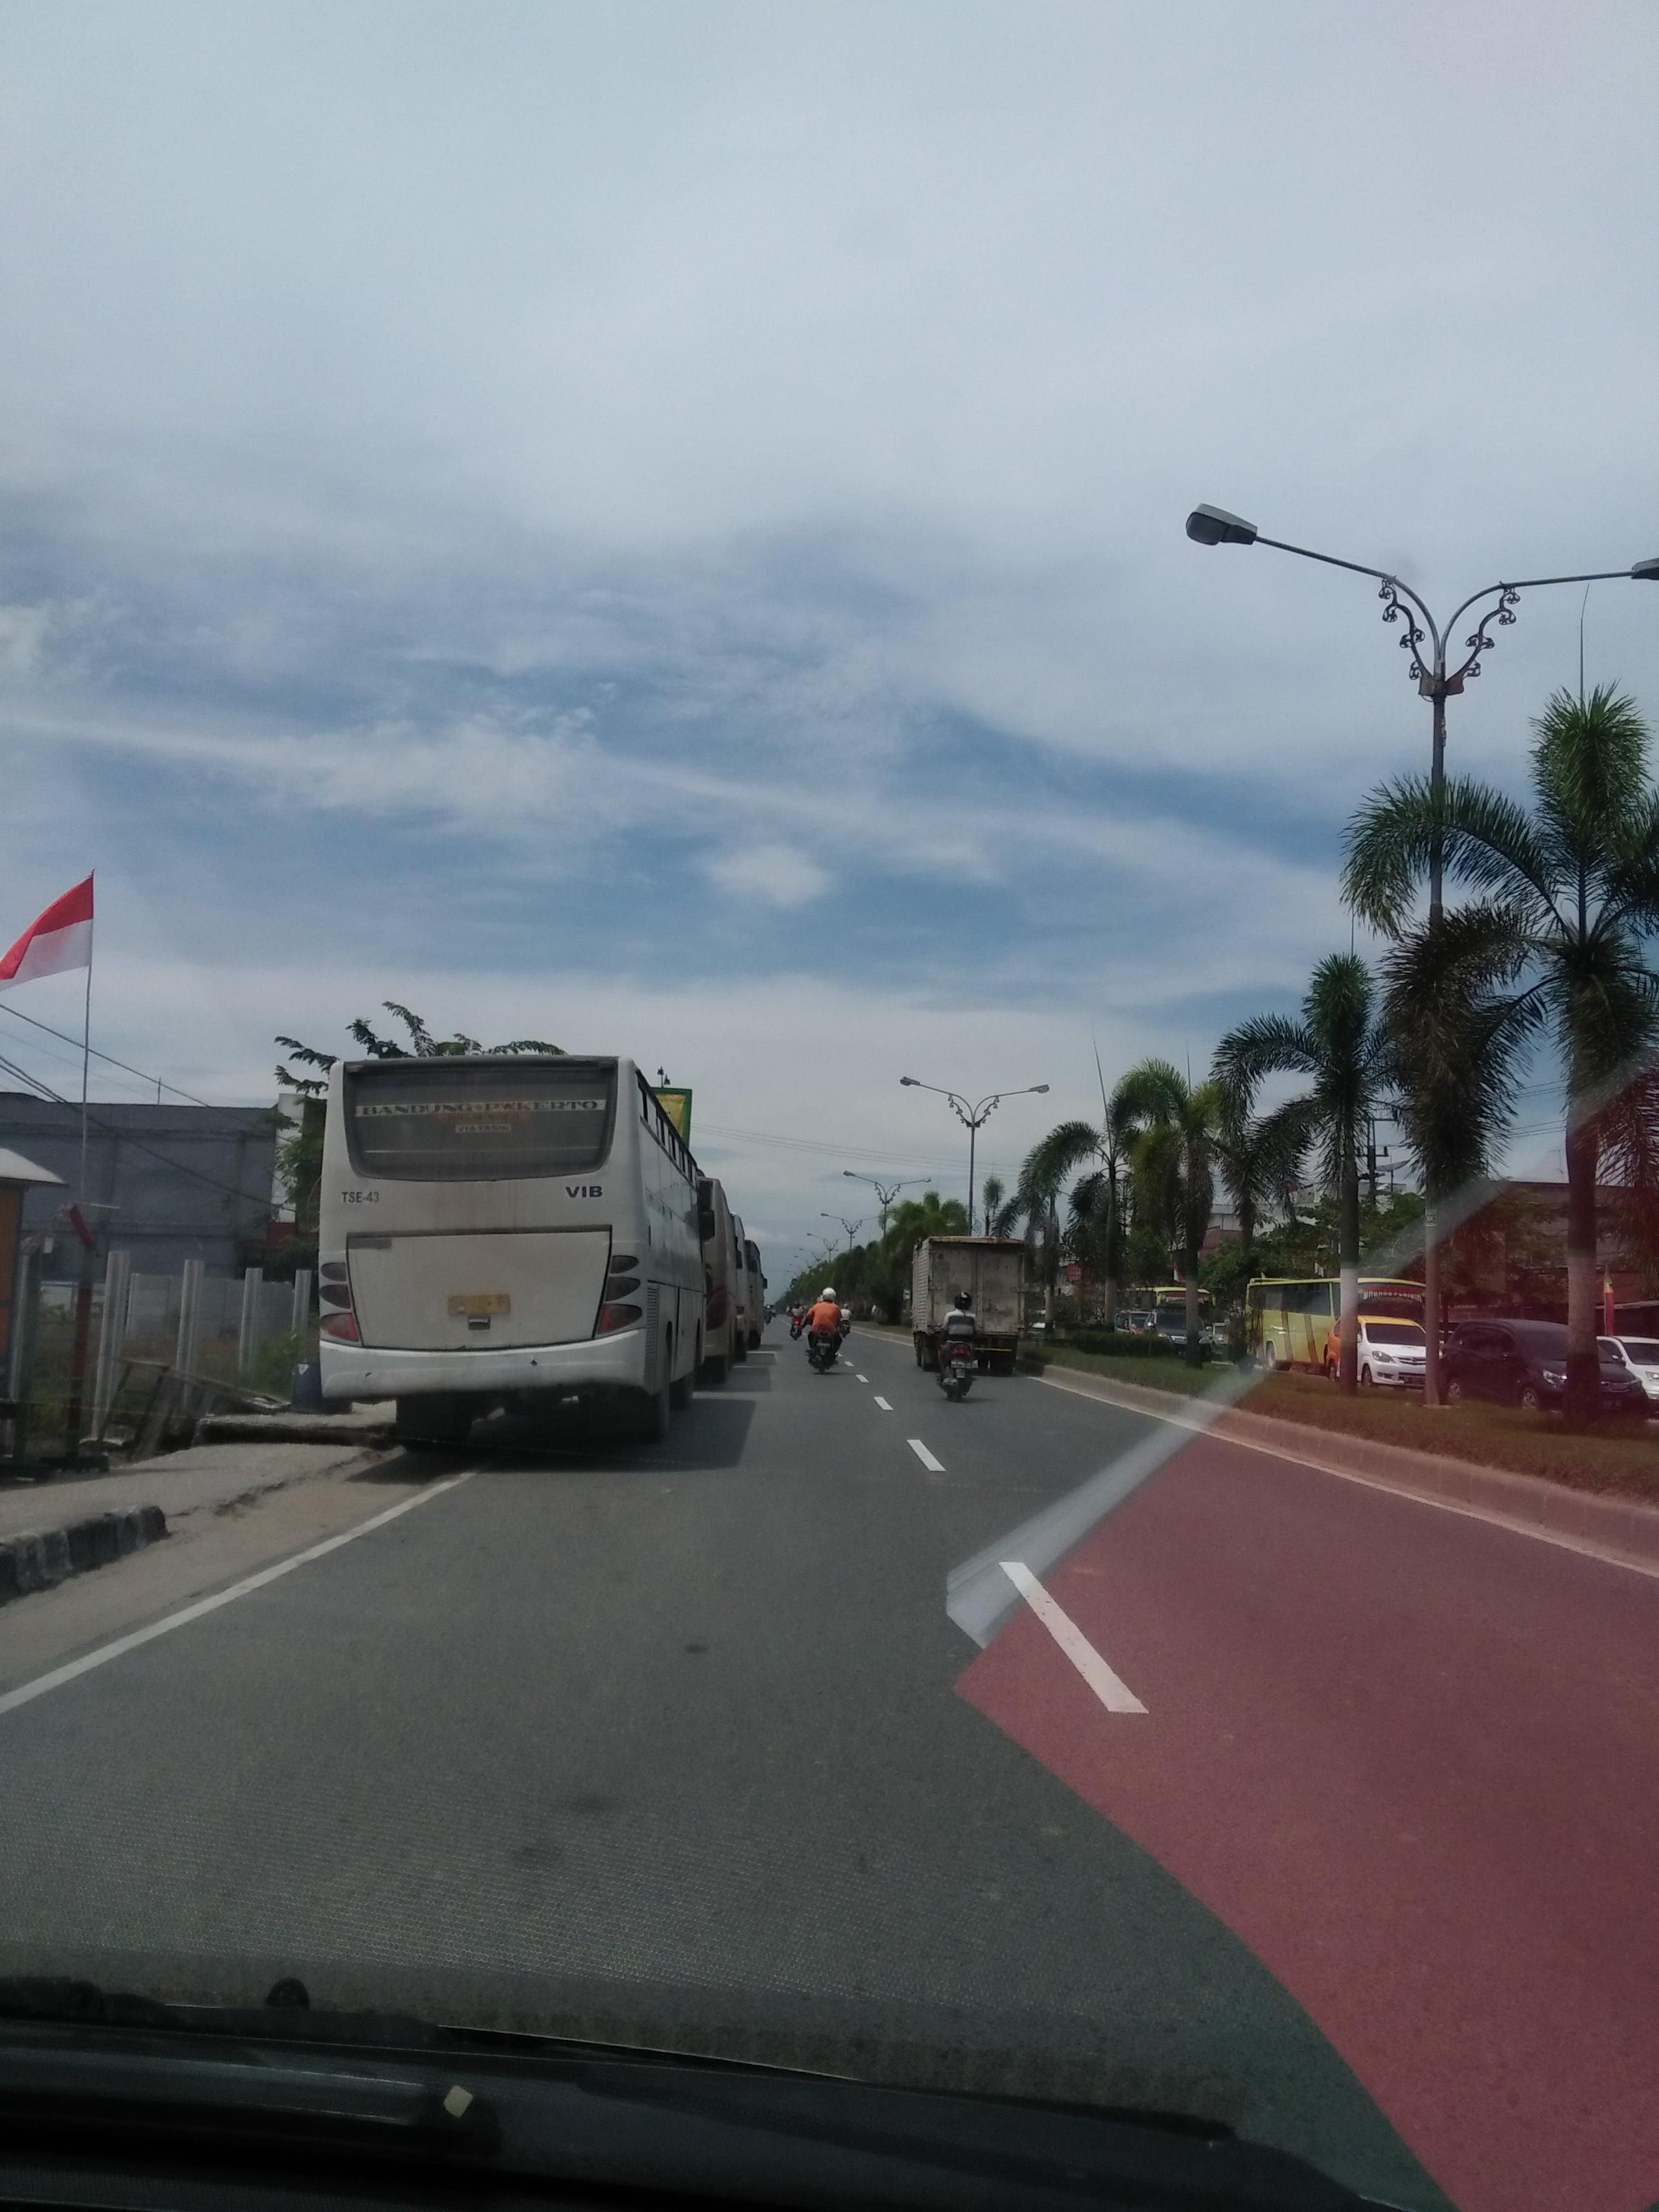 Bus Karyawan Kontraktor PT RAPP Parkir Sembarangan di Jalan Lintas Timur Pihak Berwajib Tutup Mata